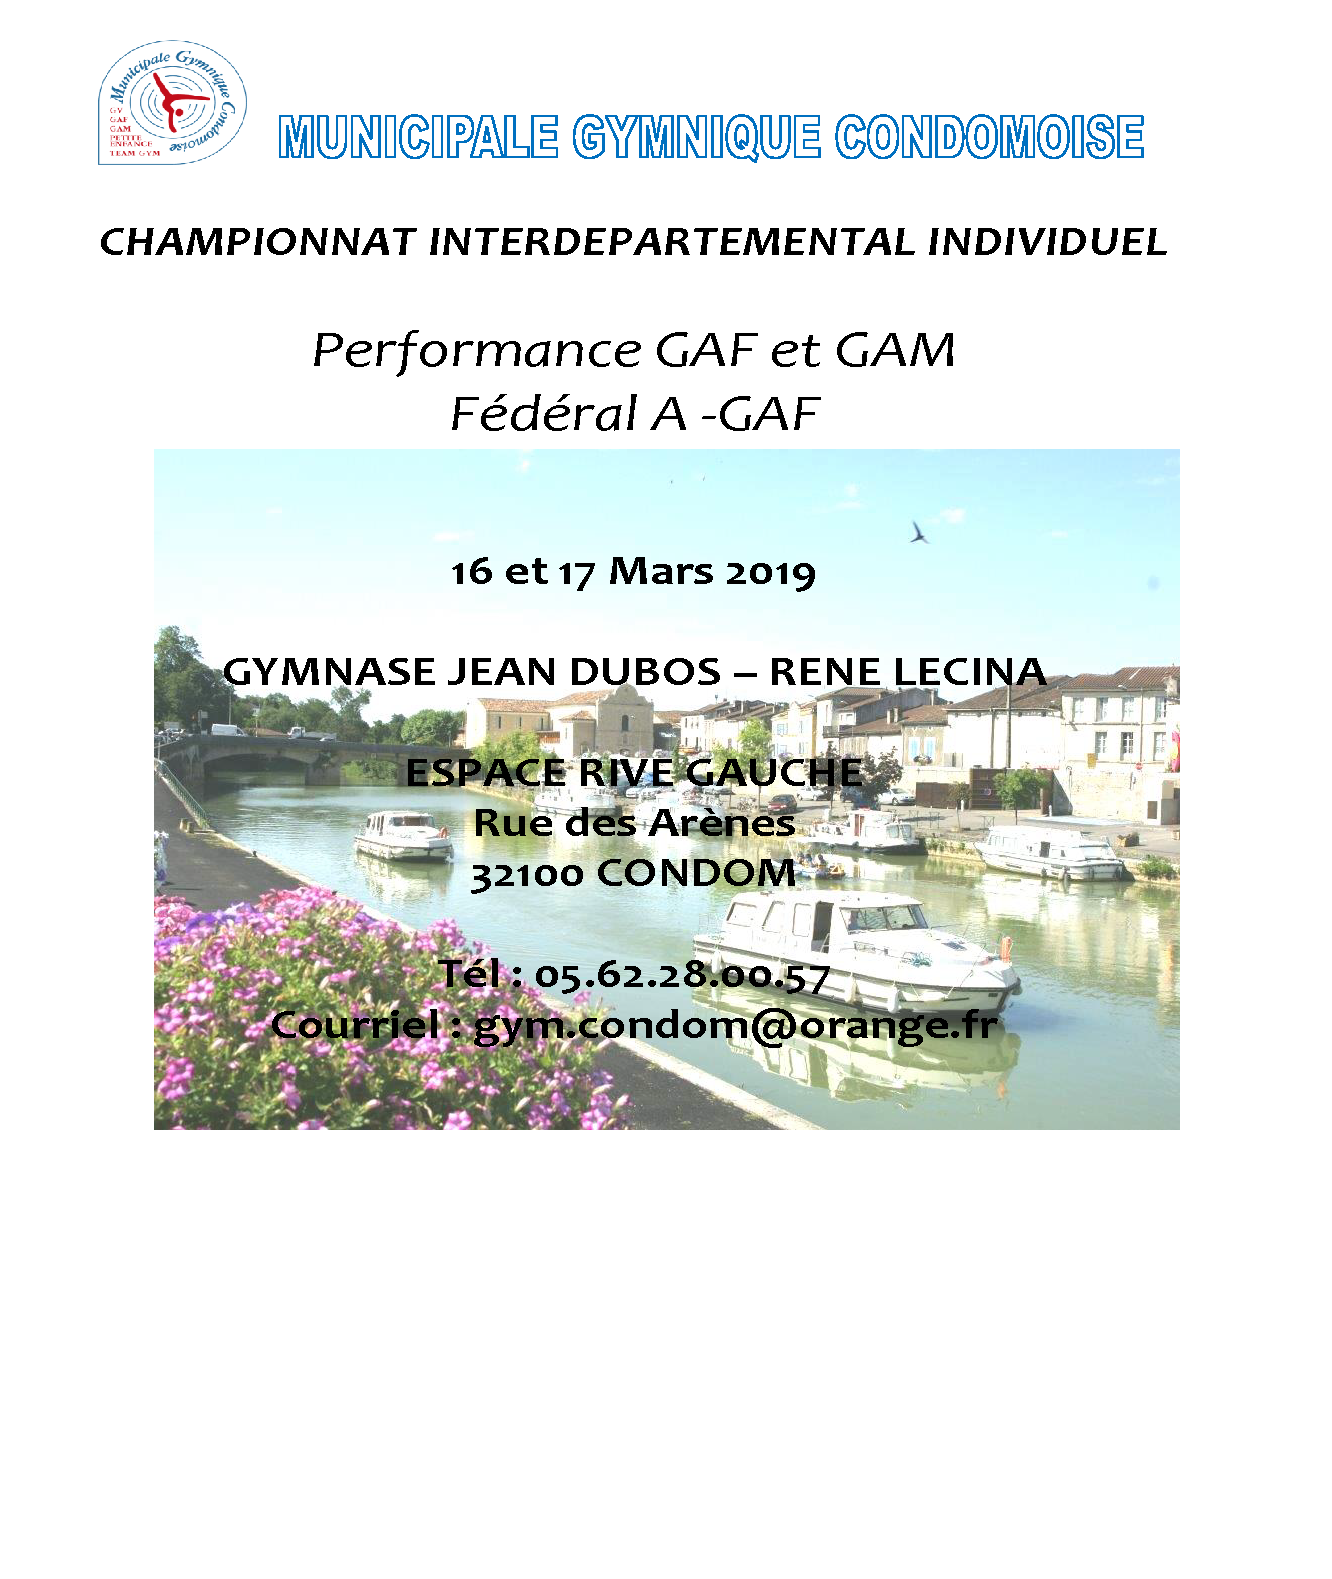 CHAMPIONNAT INTERDEPARTEMENTAL INDIVIDUEL  GAF Performance et Fédéral CONDOM